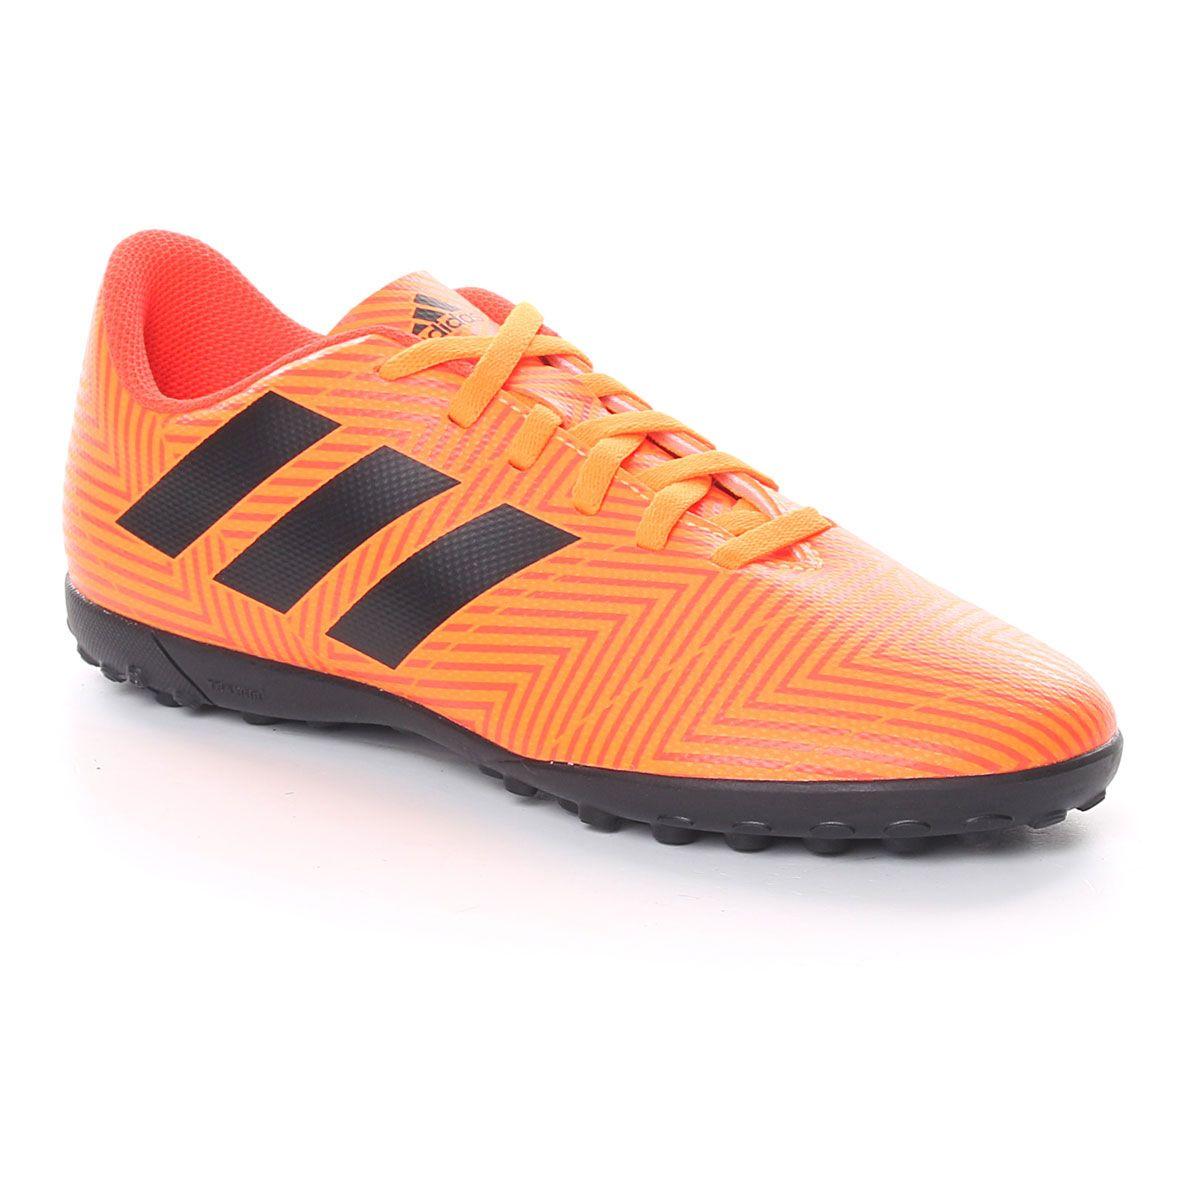 adidas Nemeziz Tango 18.4 TF J Orange Black